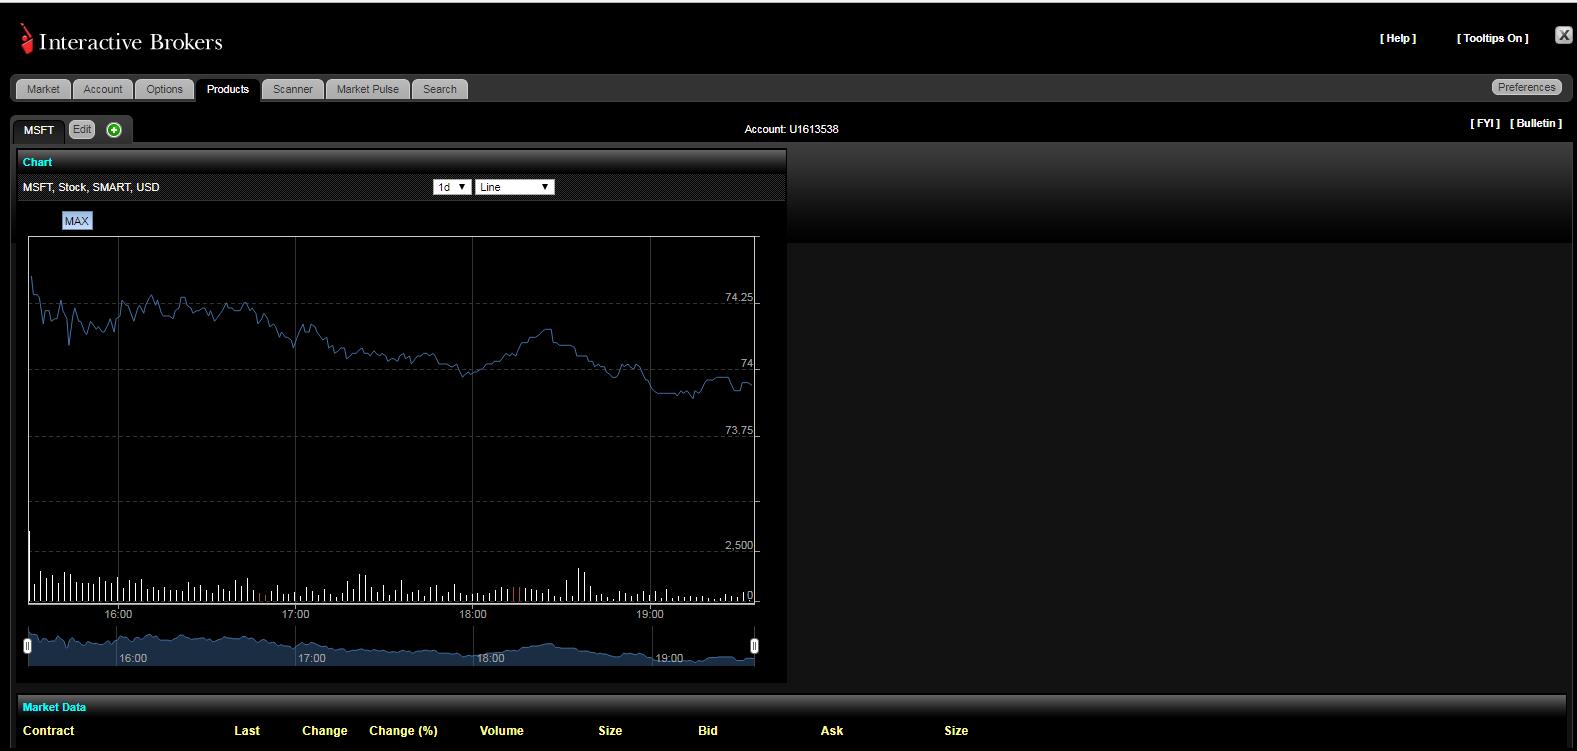 Interactive-brokers-review-web-trading-platform-chart